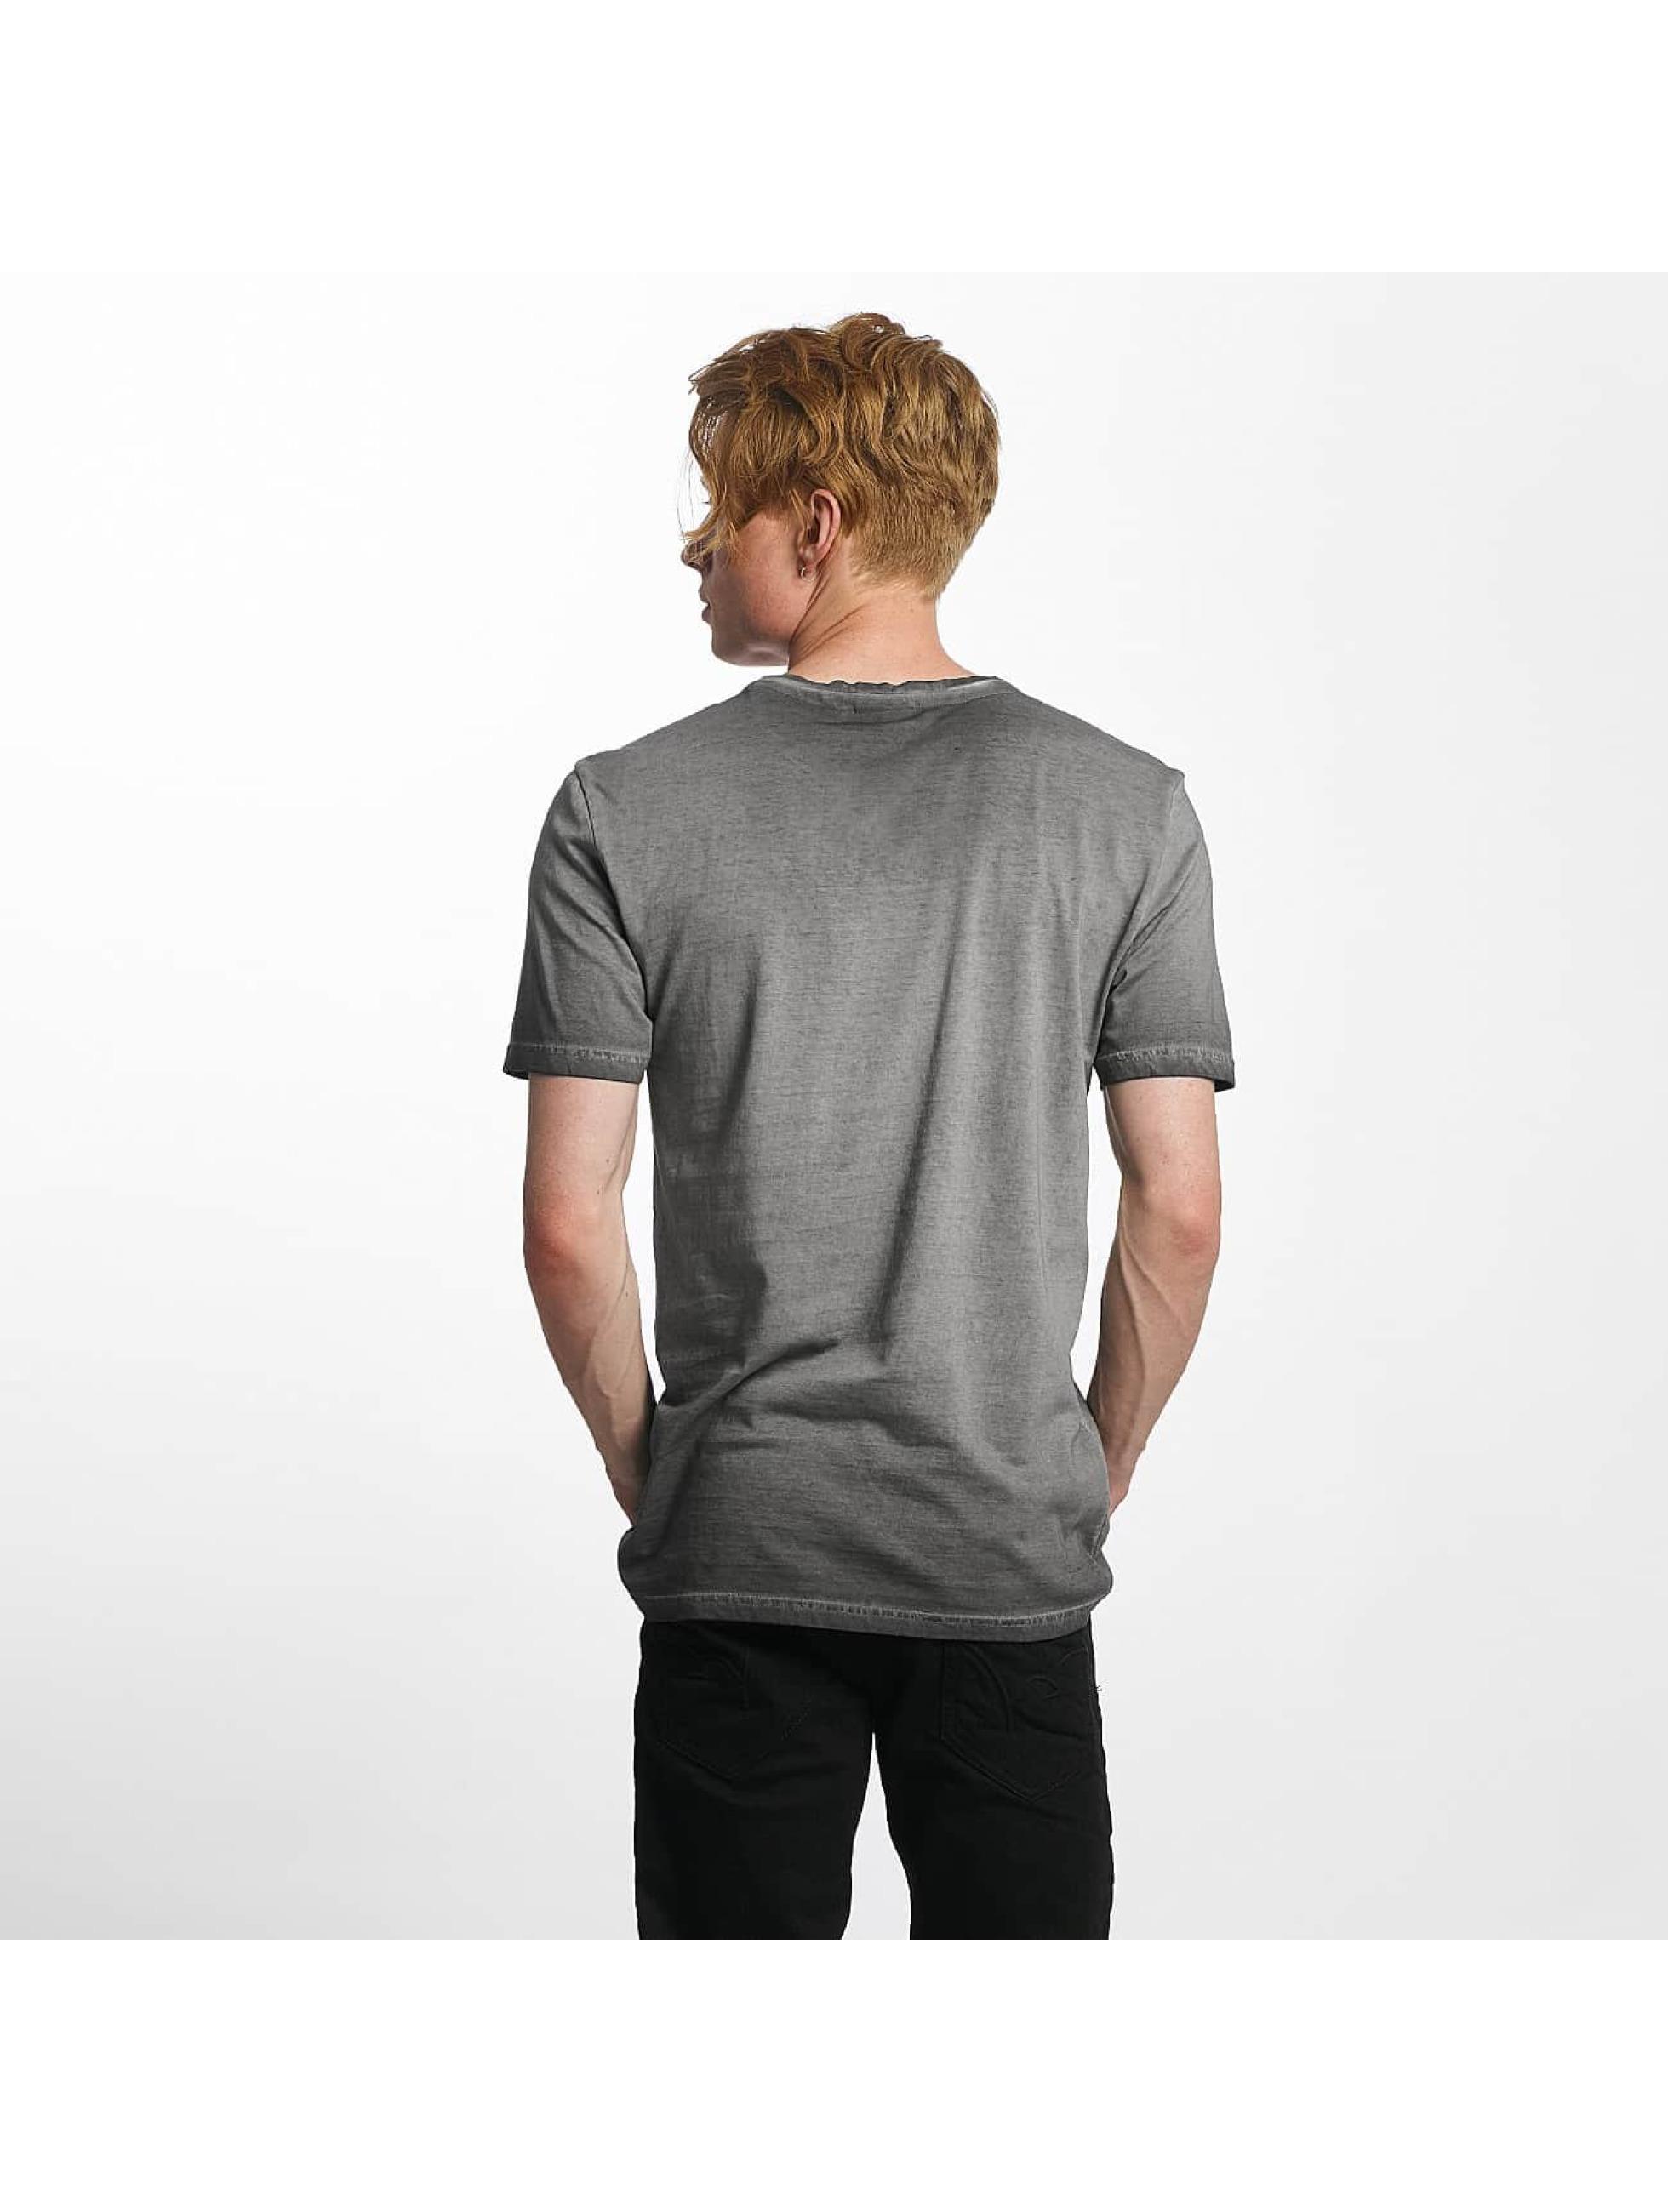 Kaporal keep living gris homme t shirt kaporal acheter - Tee shirt kaporal pas cher homme ...